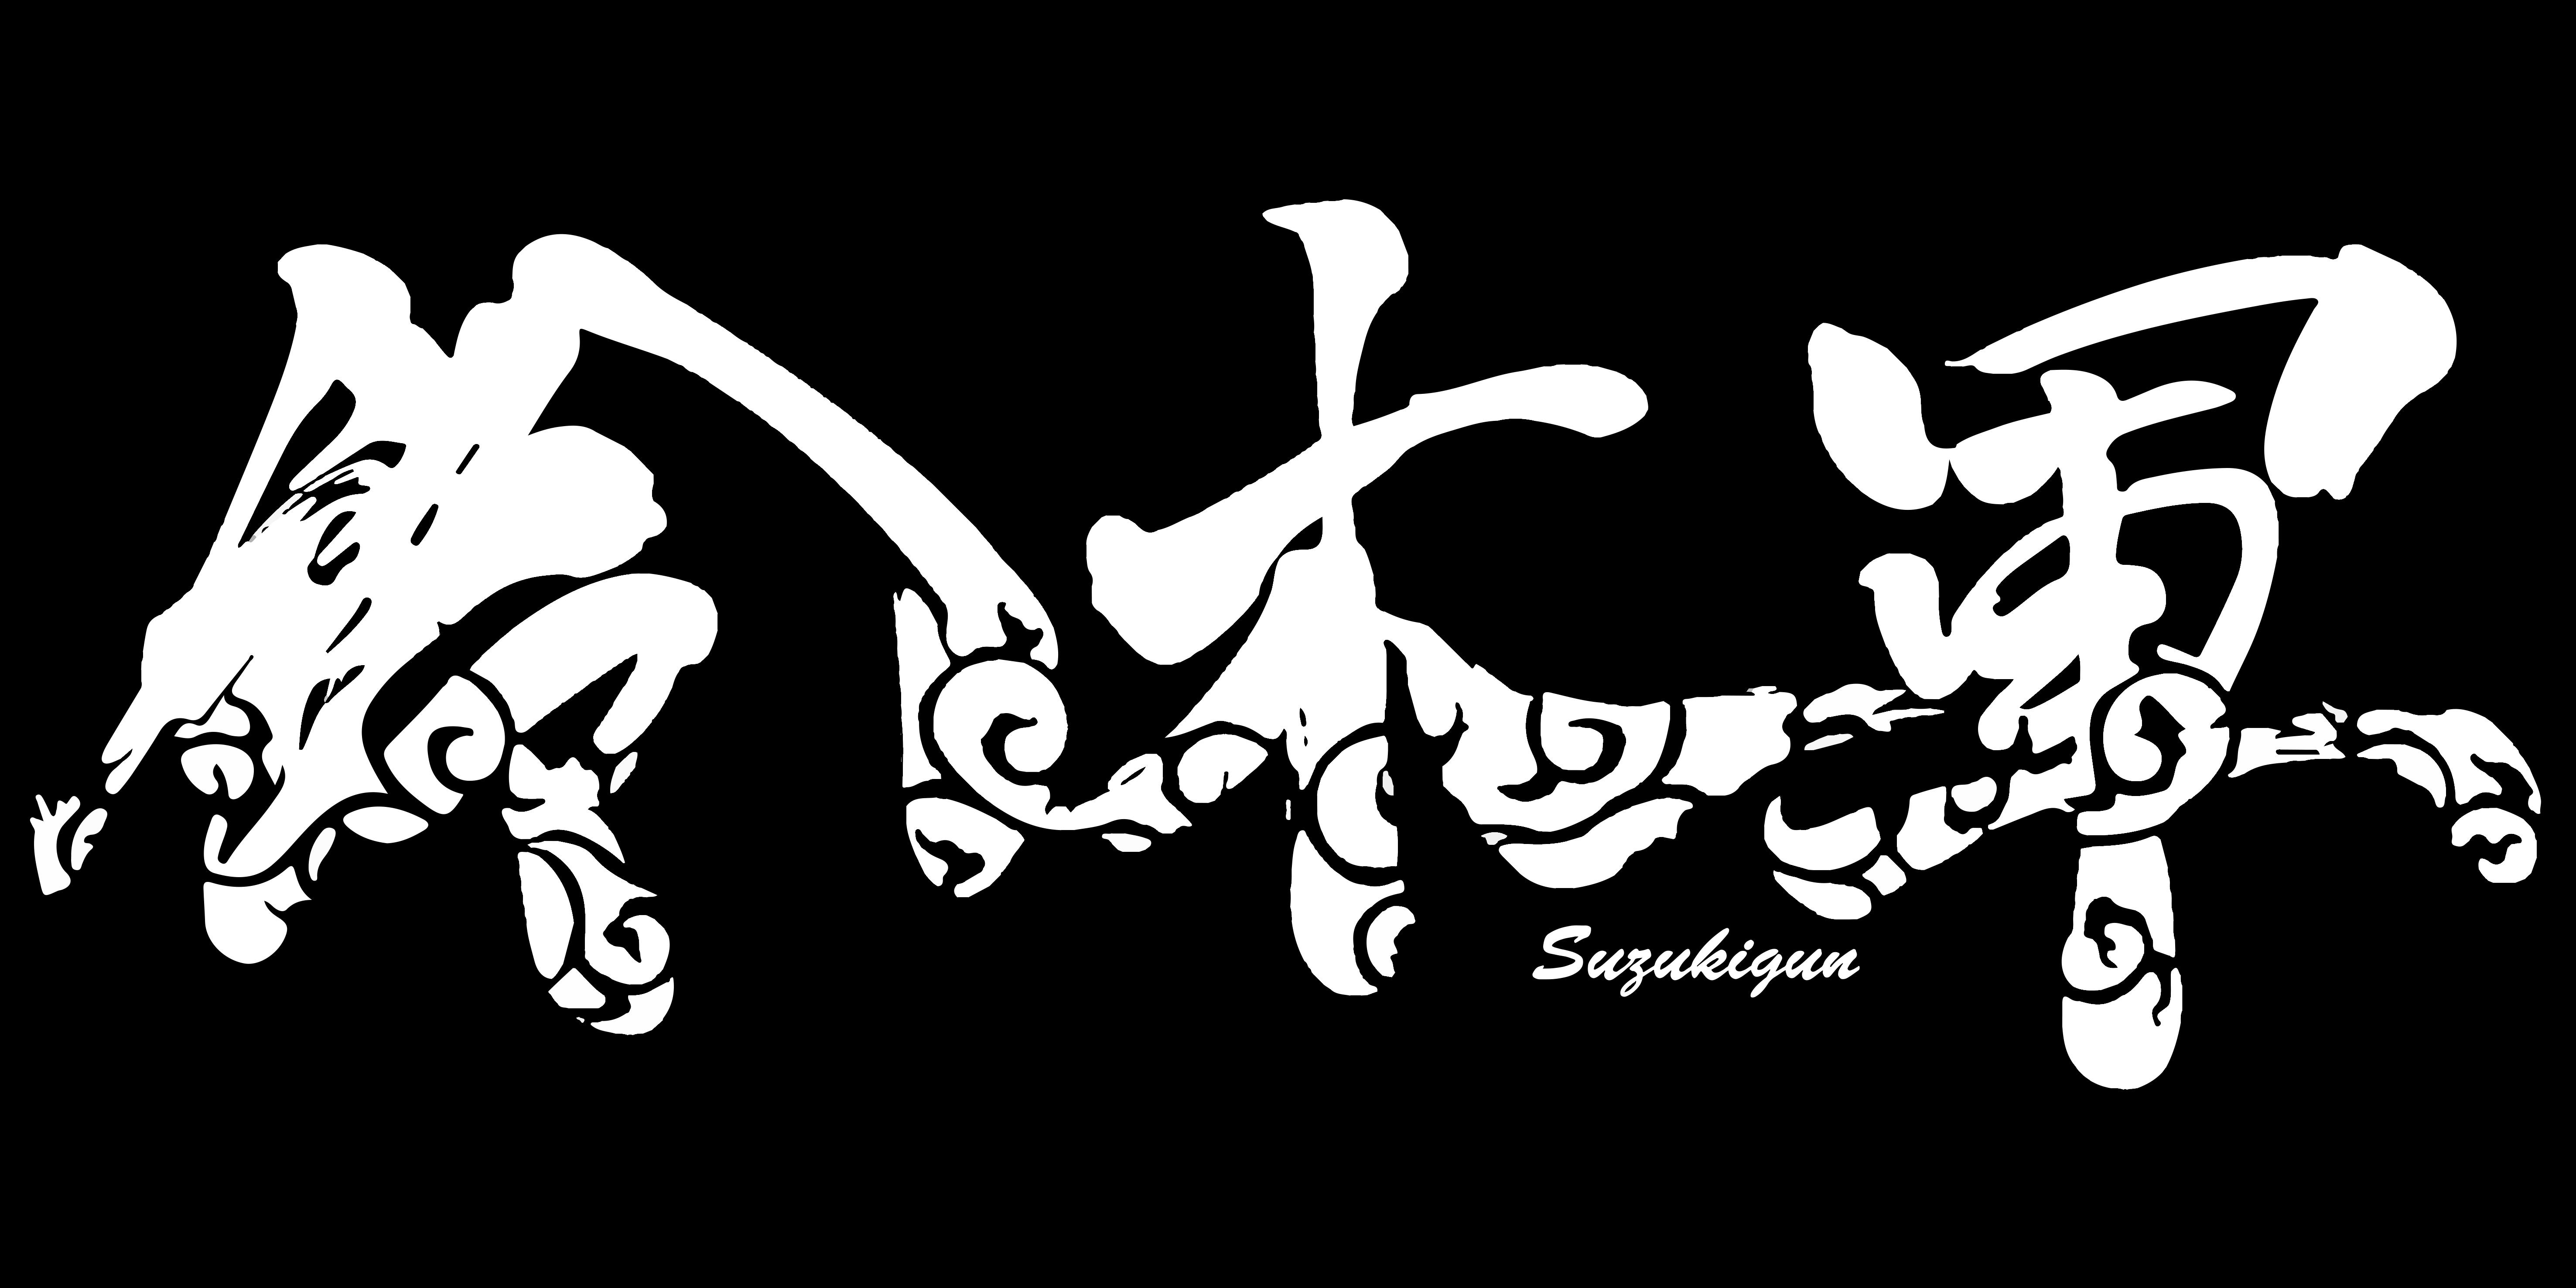 File:Suzukigun.png